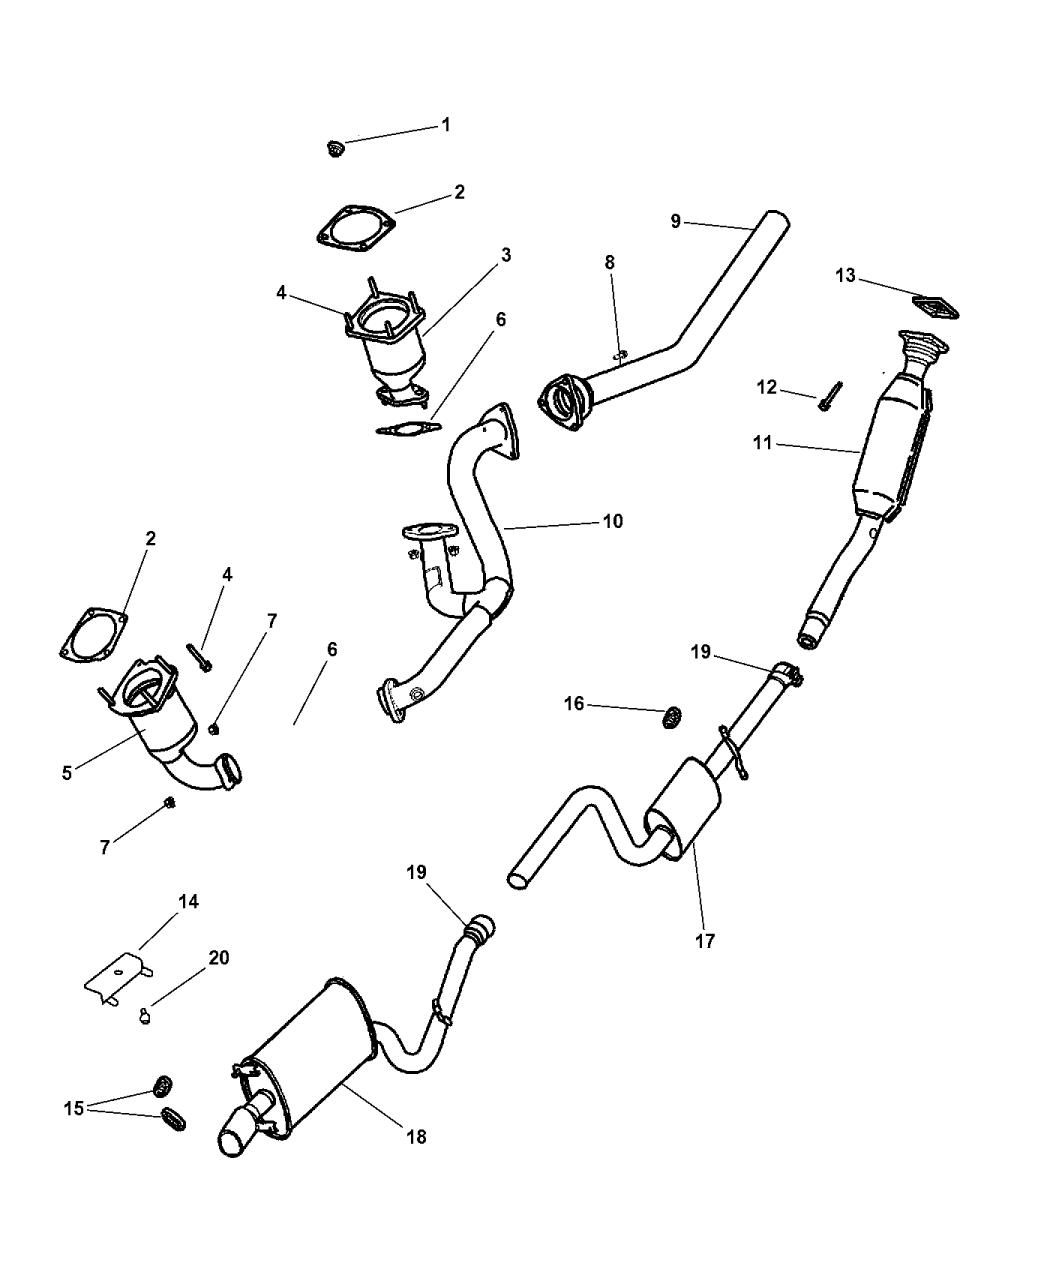 2002 Chrysler Sebring Sedan Convertible Exhaust System Diagram Of